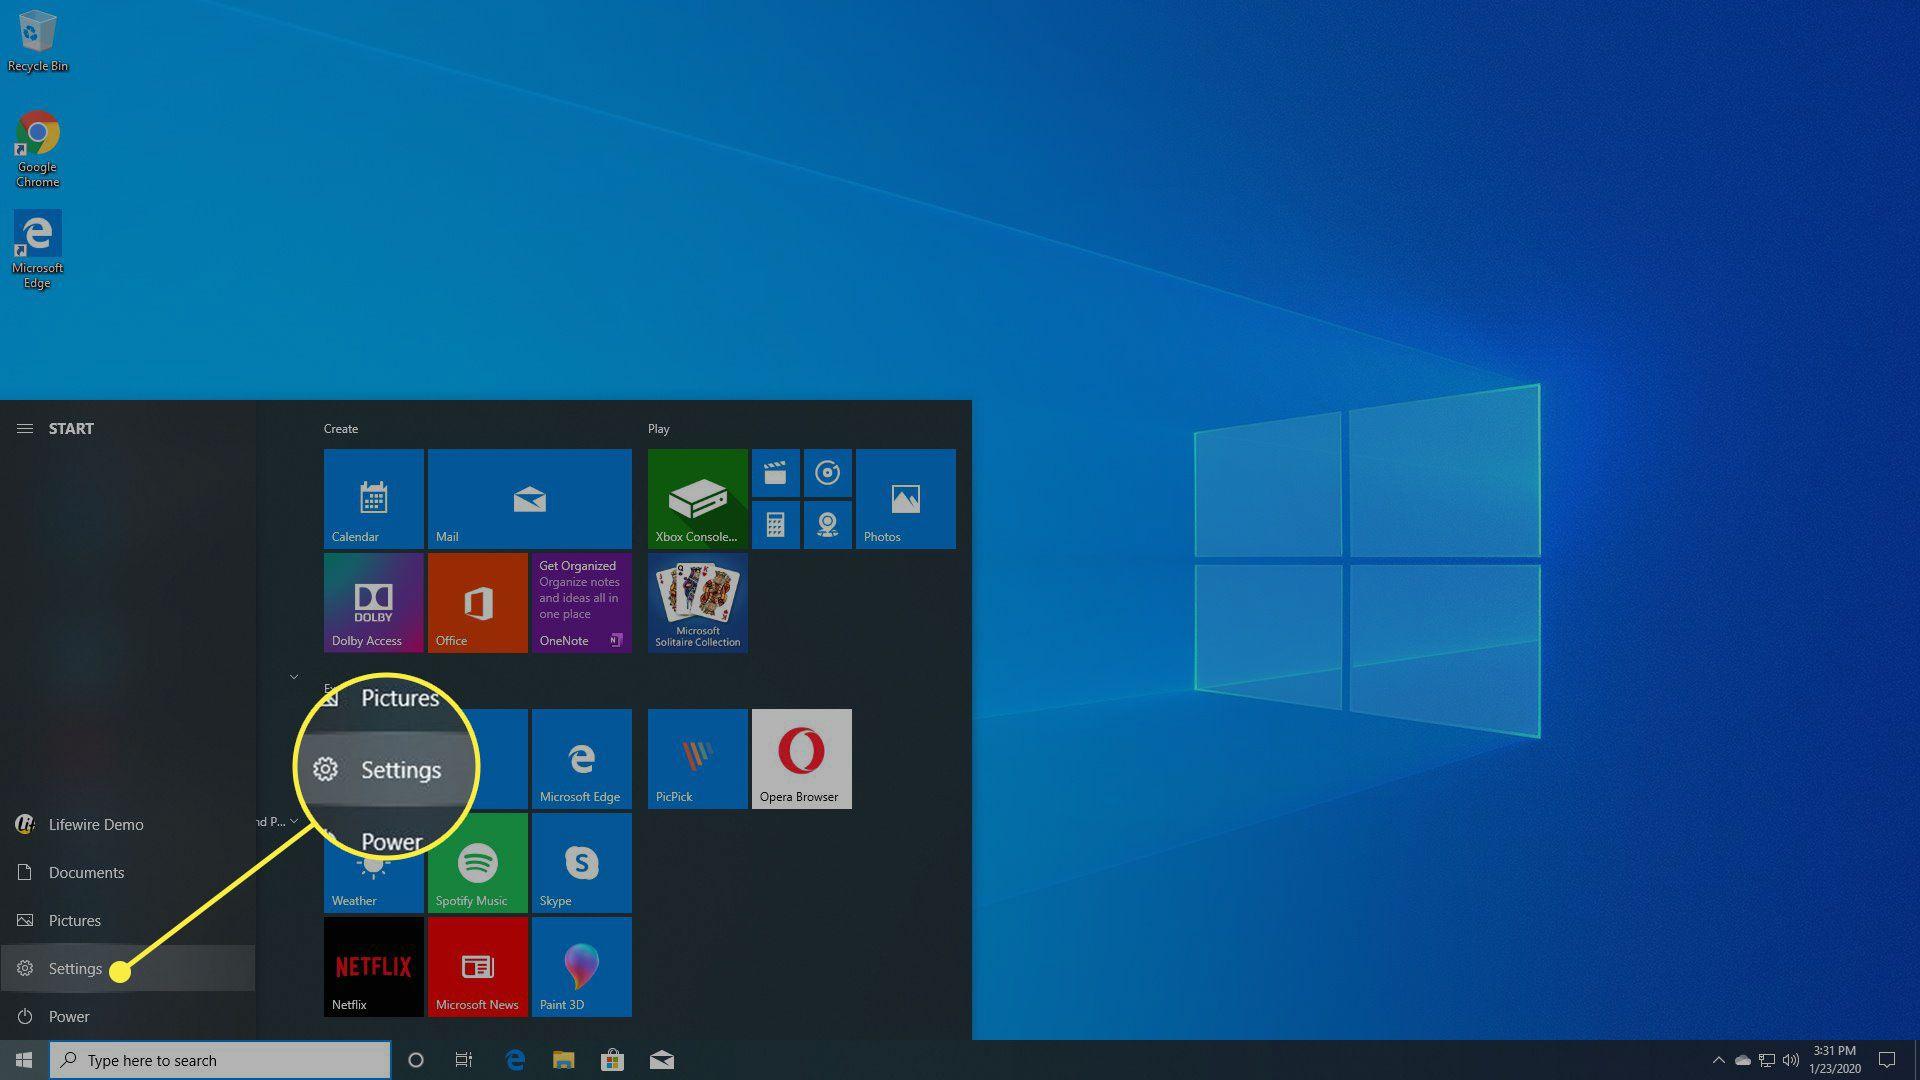 Settings under the Windows 10 Start menu